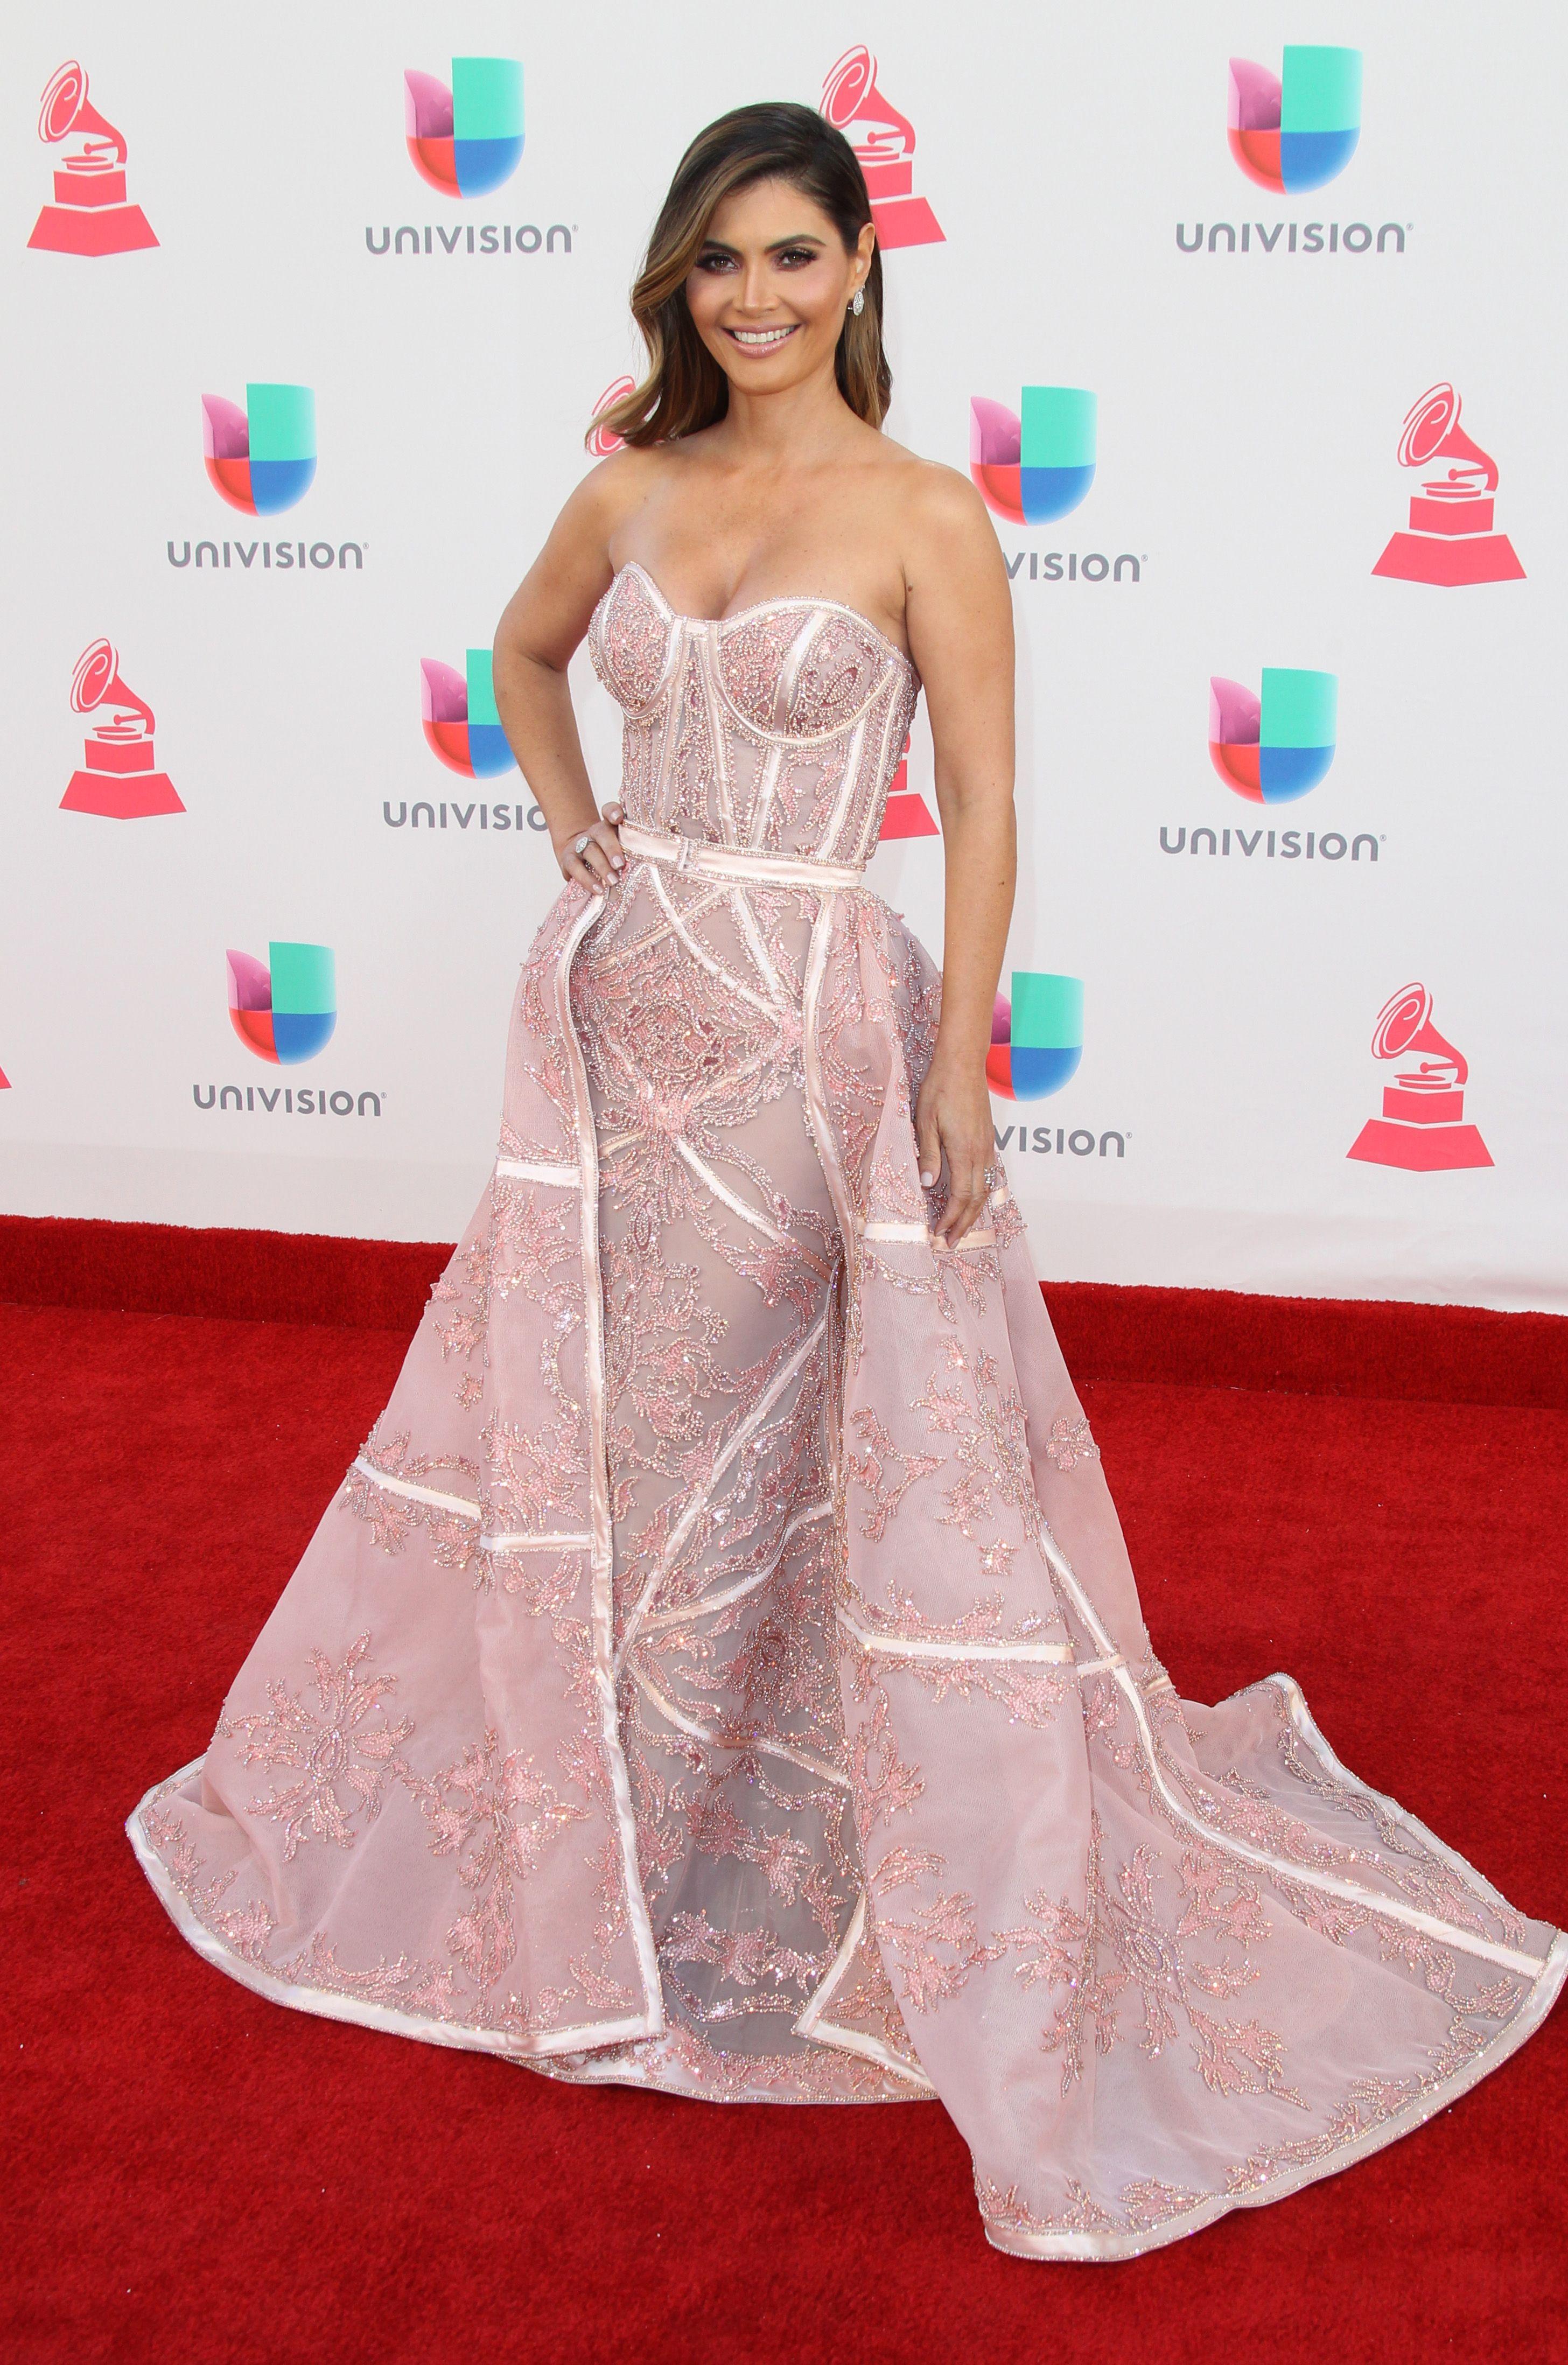 Lujoso Vestidos De Dama Vegas Friso - Colección de Vestidos de Boda ...